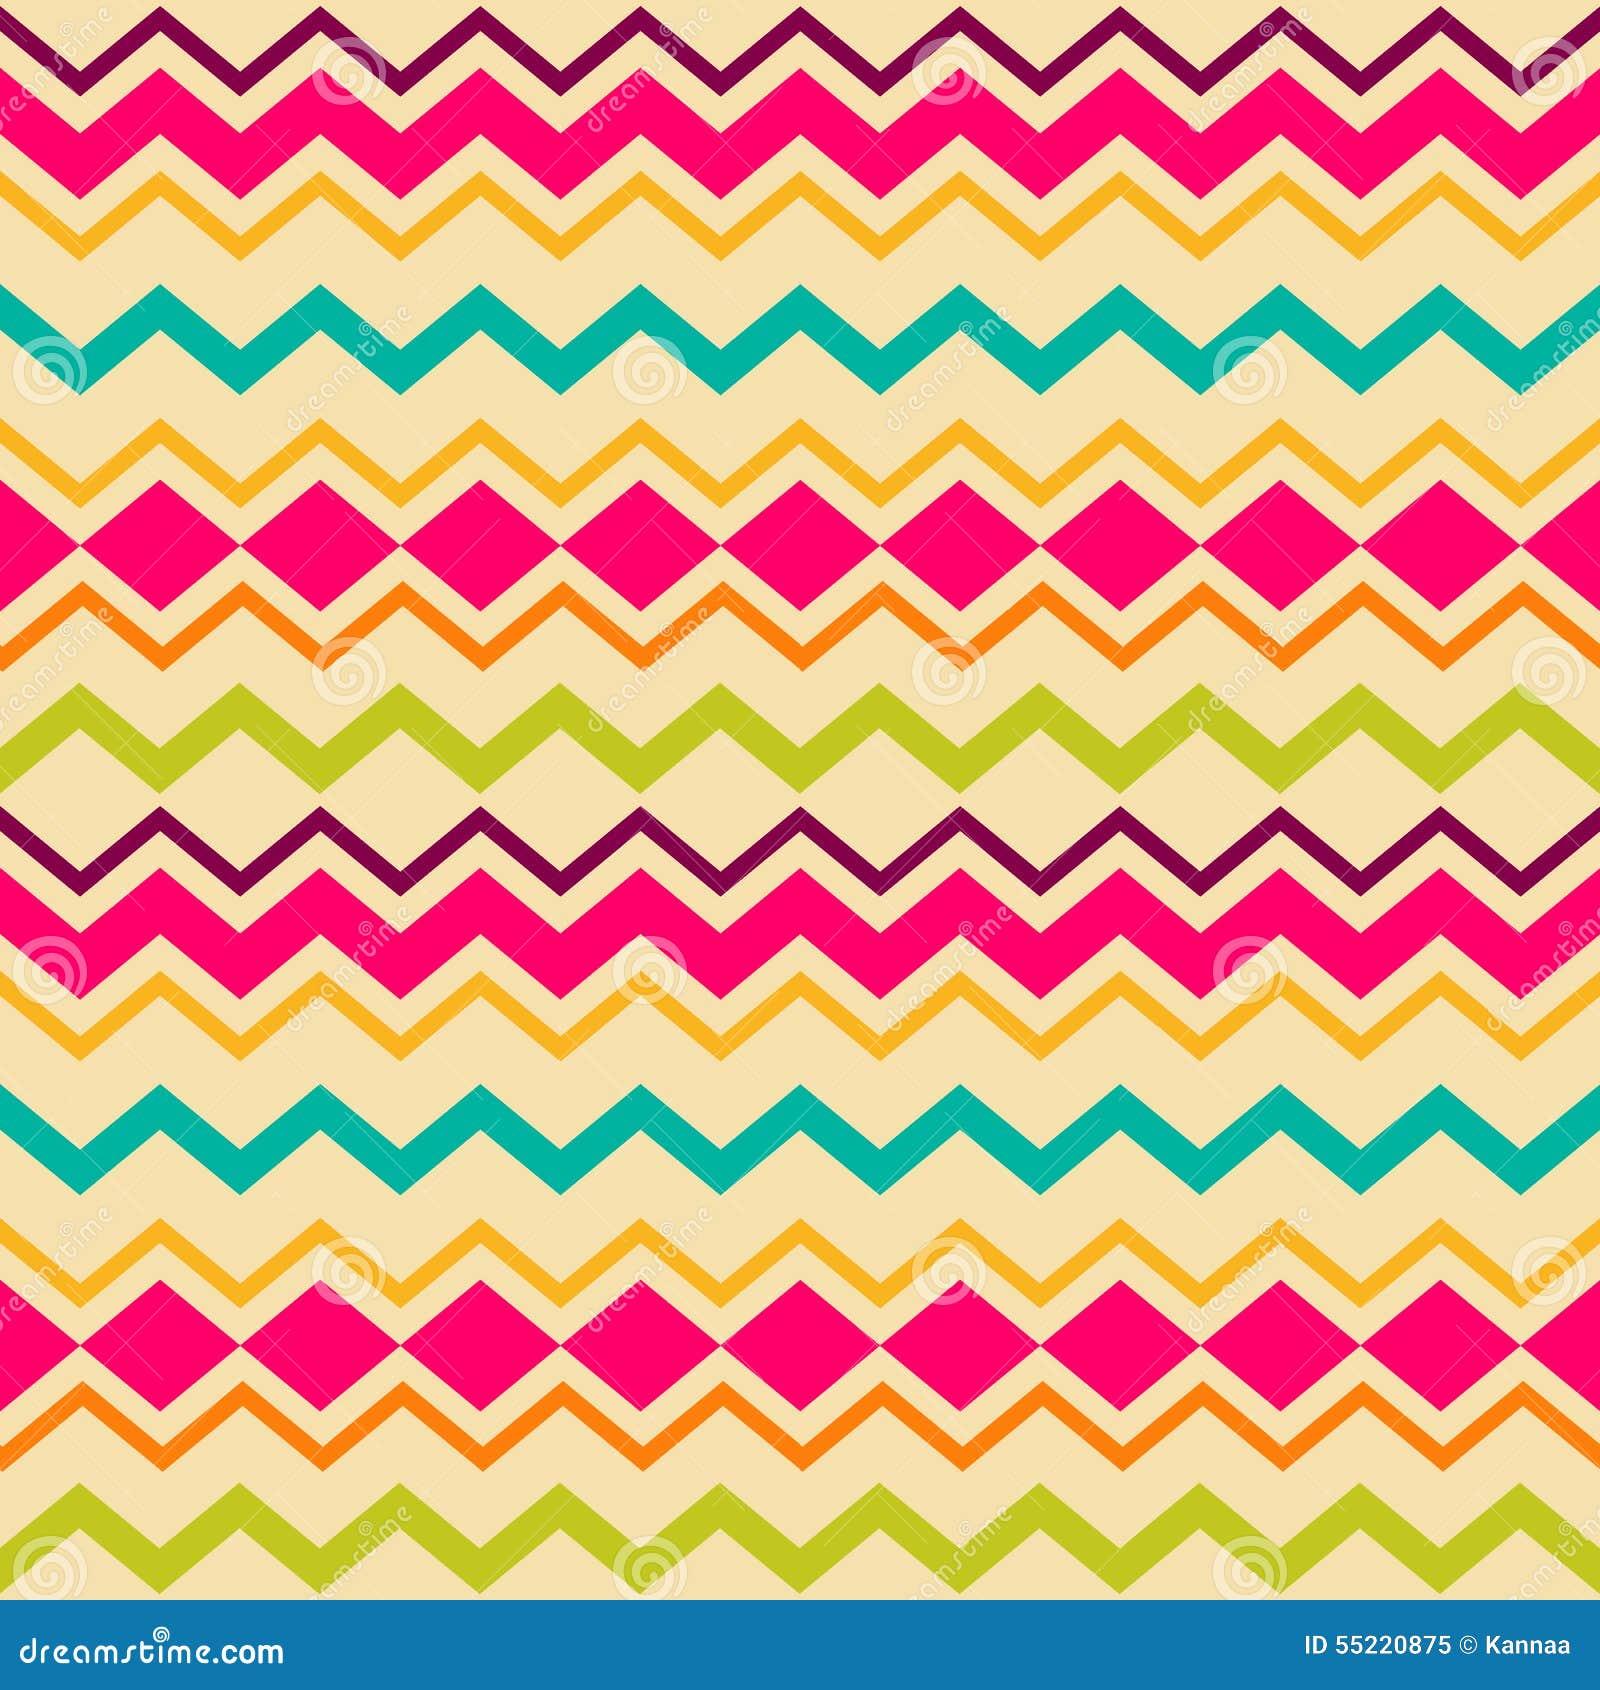 ethnic tribal zig zag seamless pattern stock vector image 55220875. Black Bedroom Furniture Sets. Home Design Ideas